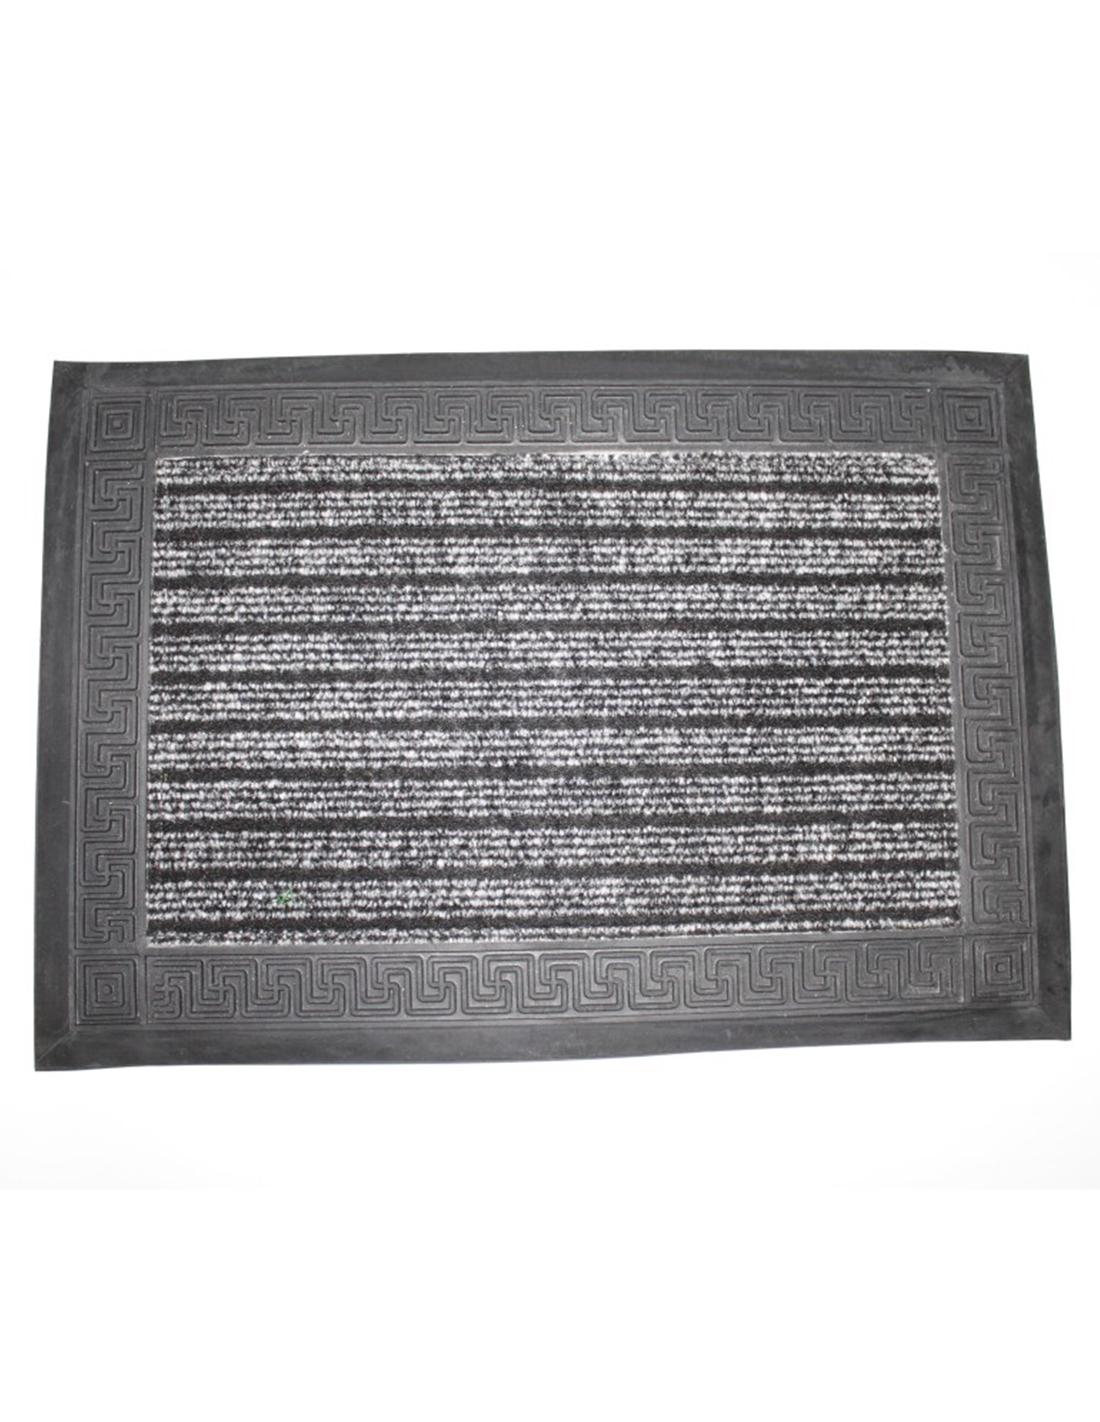 Felpudo de Goma/Moqueta - Rollo - 53 cm x 37 cm